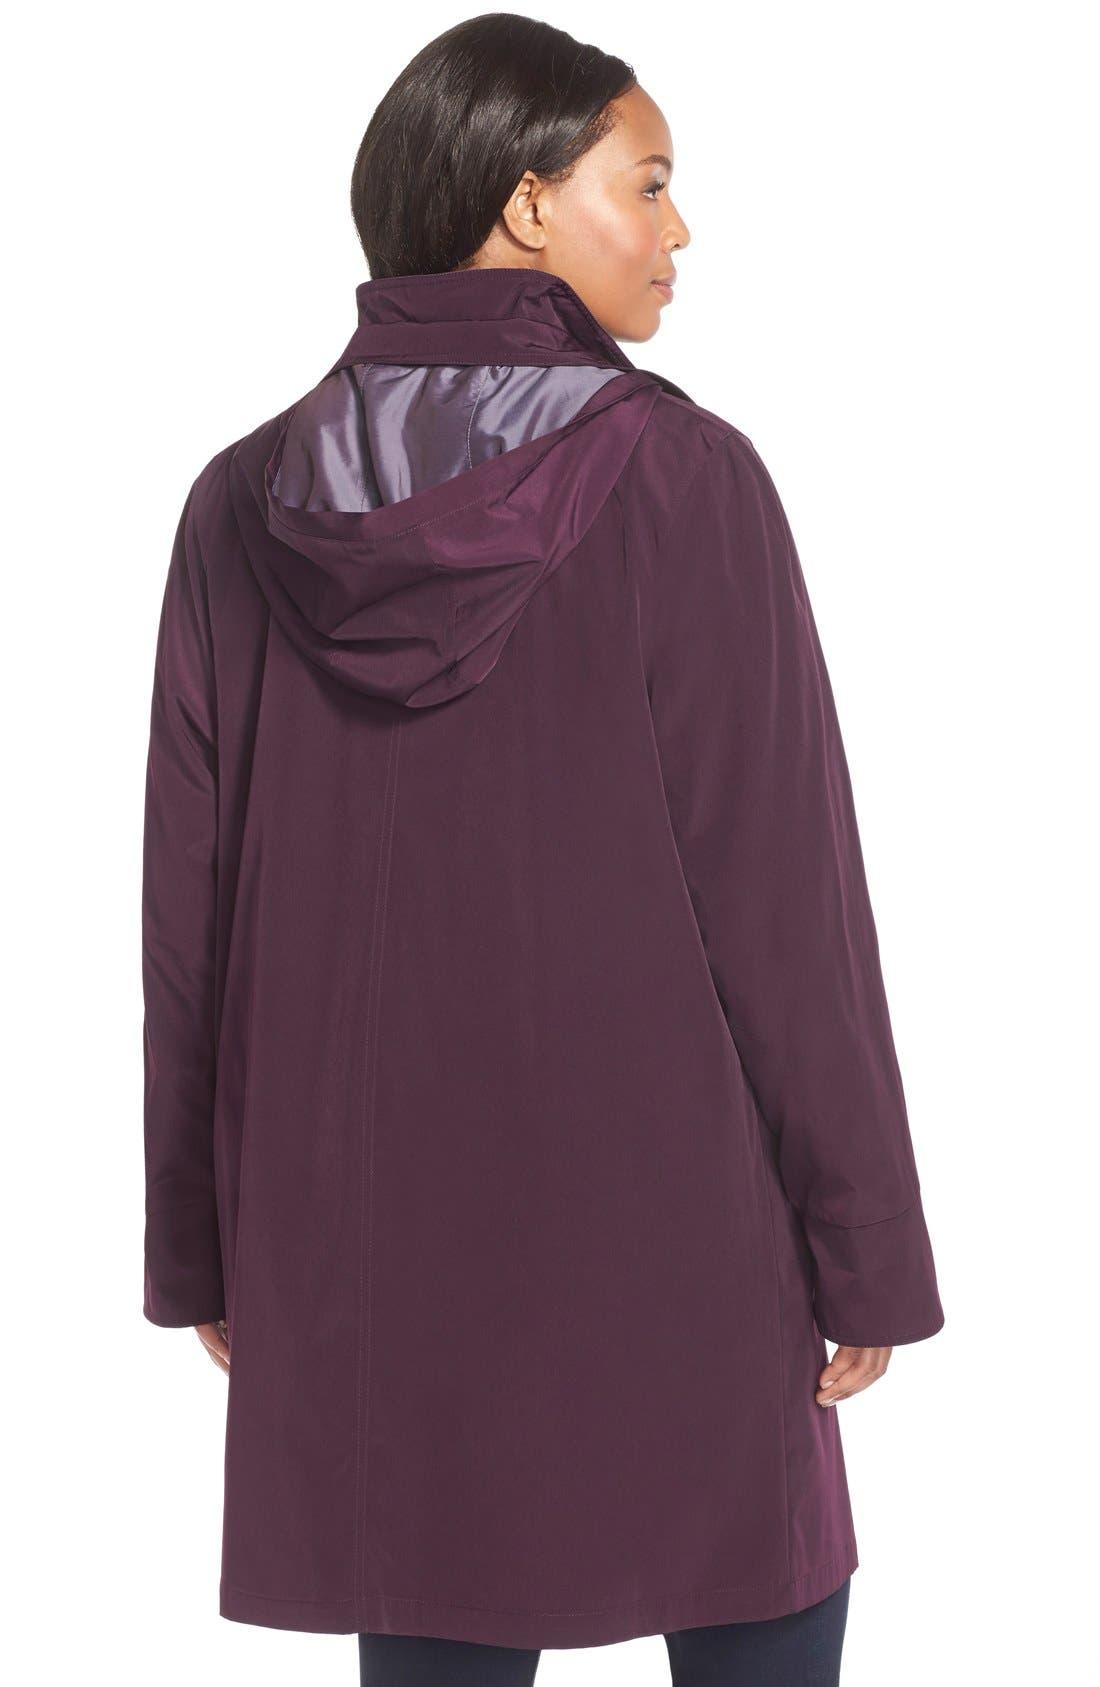 Alternate Image 2  - Gallery Two-Tone Long Silk Look Raincoat (Plus Size)